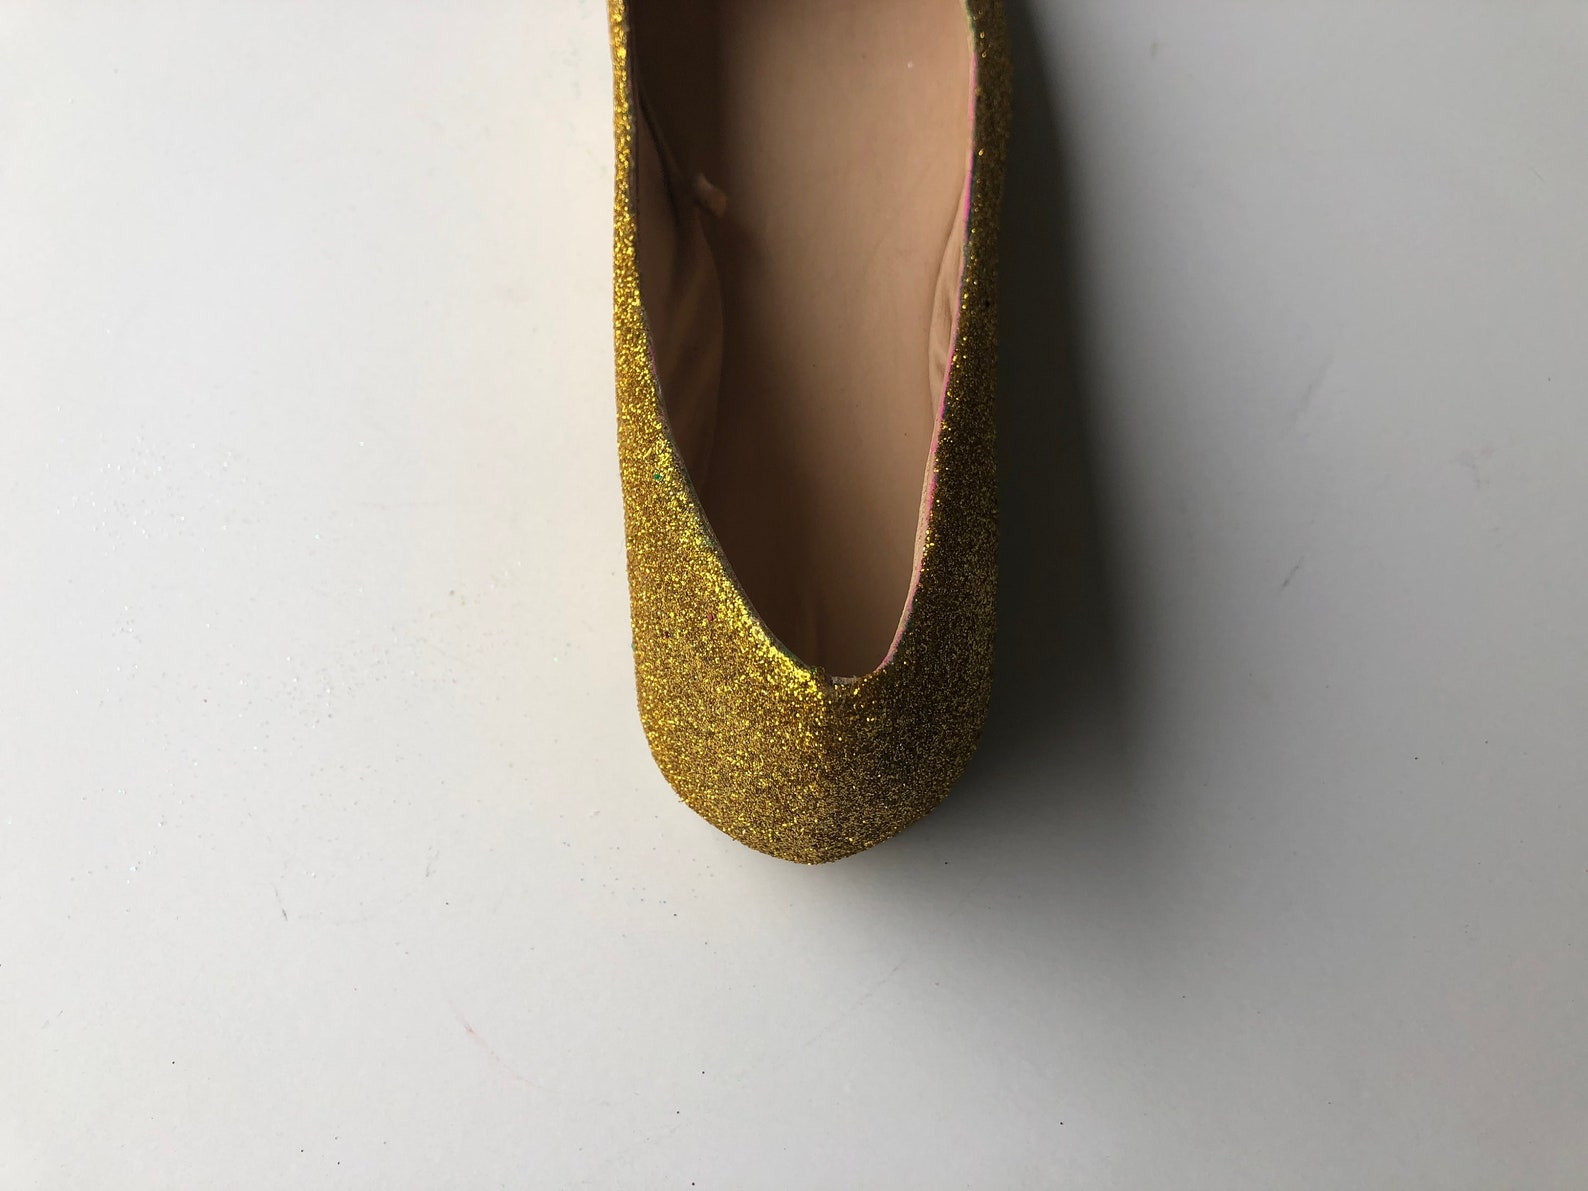 gold flats women's custom gold glitter bridal ballet flats w/gold shimmer bottoms *free u.s. shipping* jco.customs by kitty